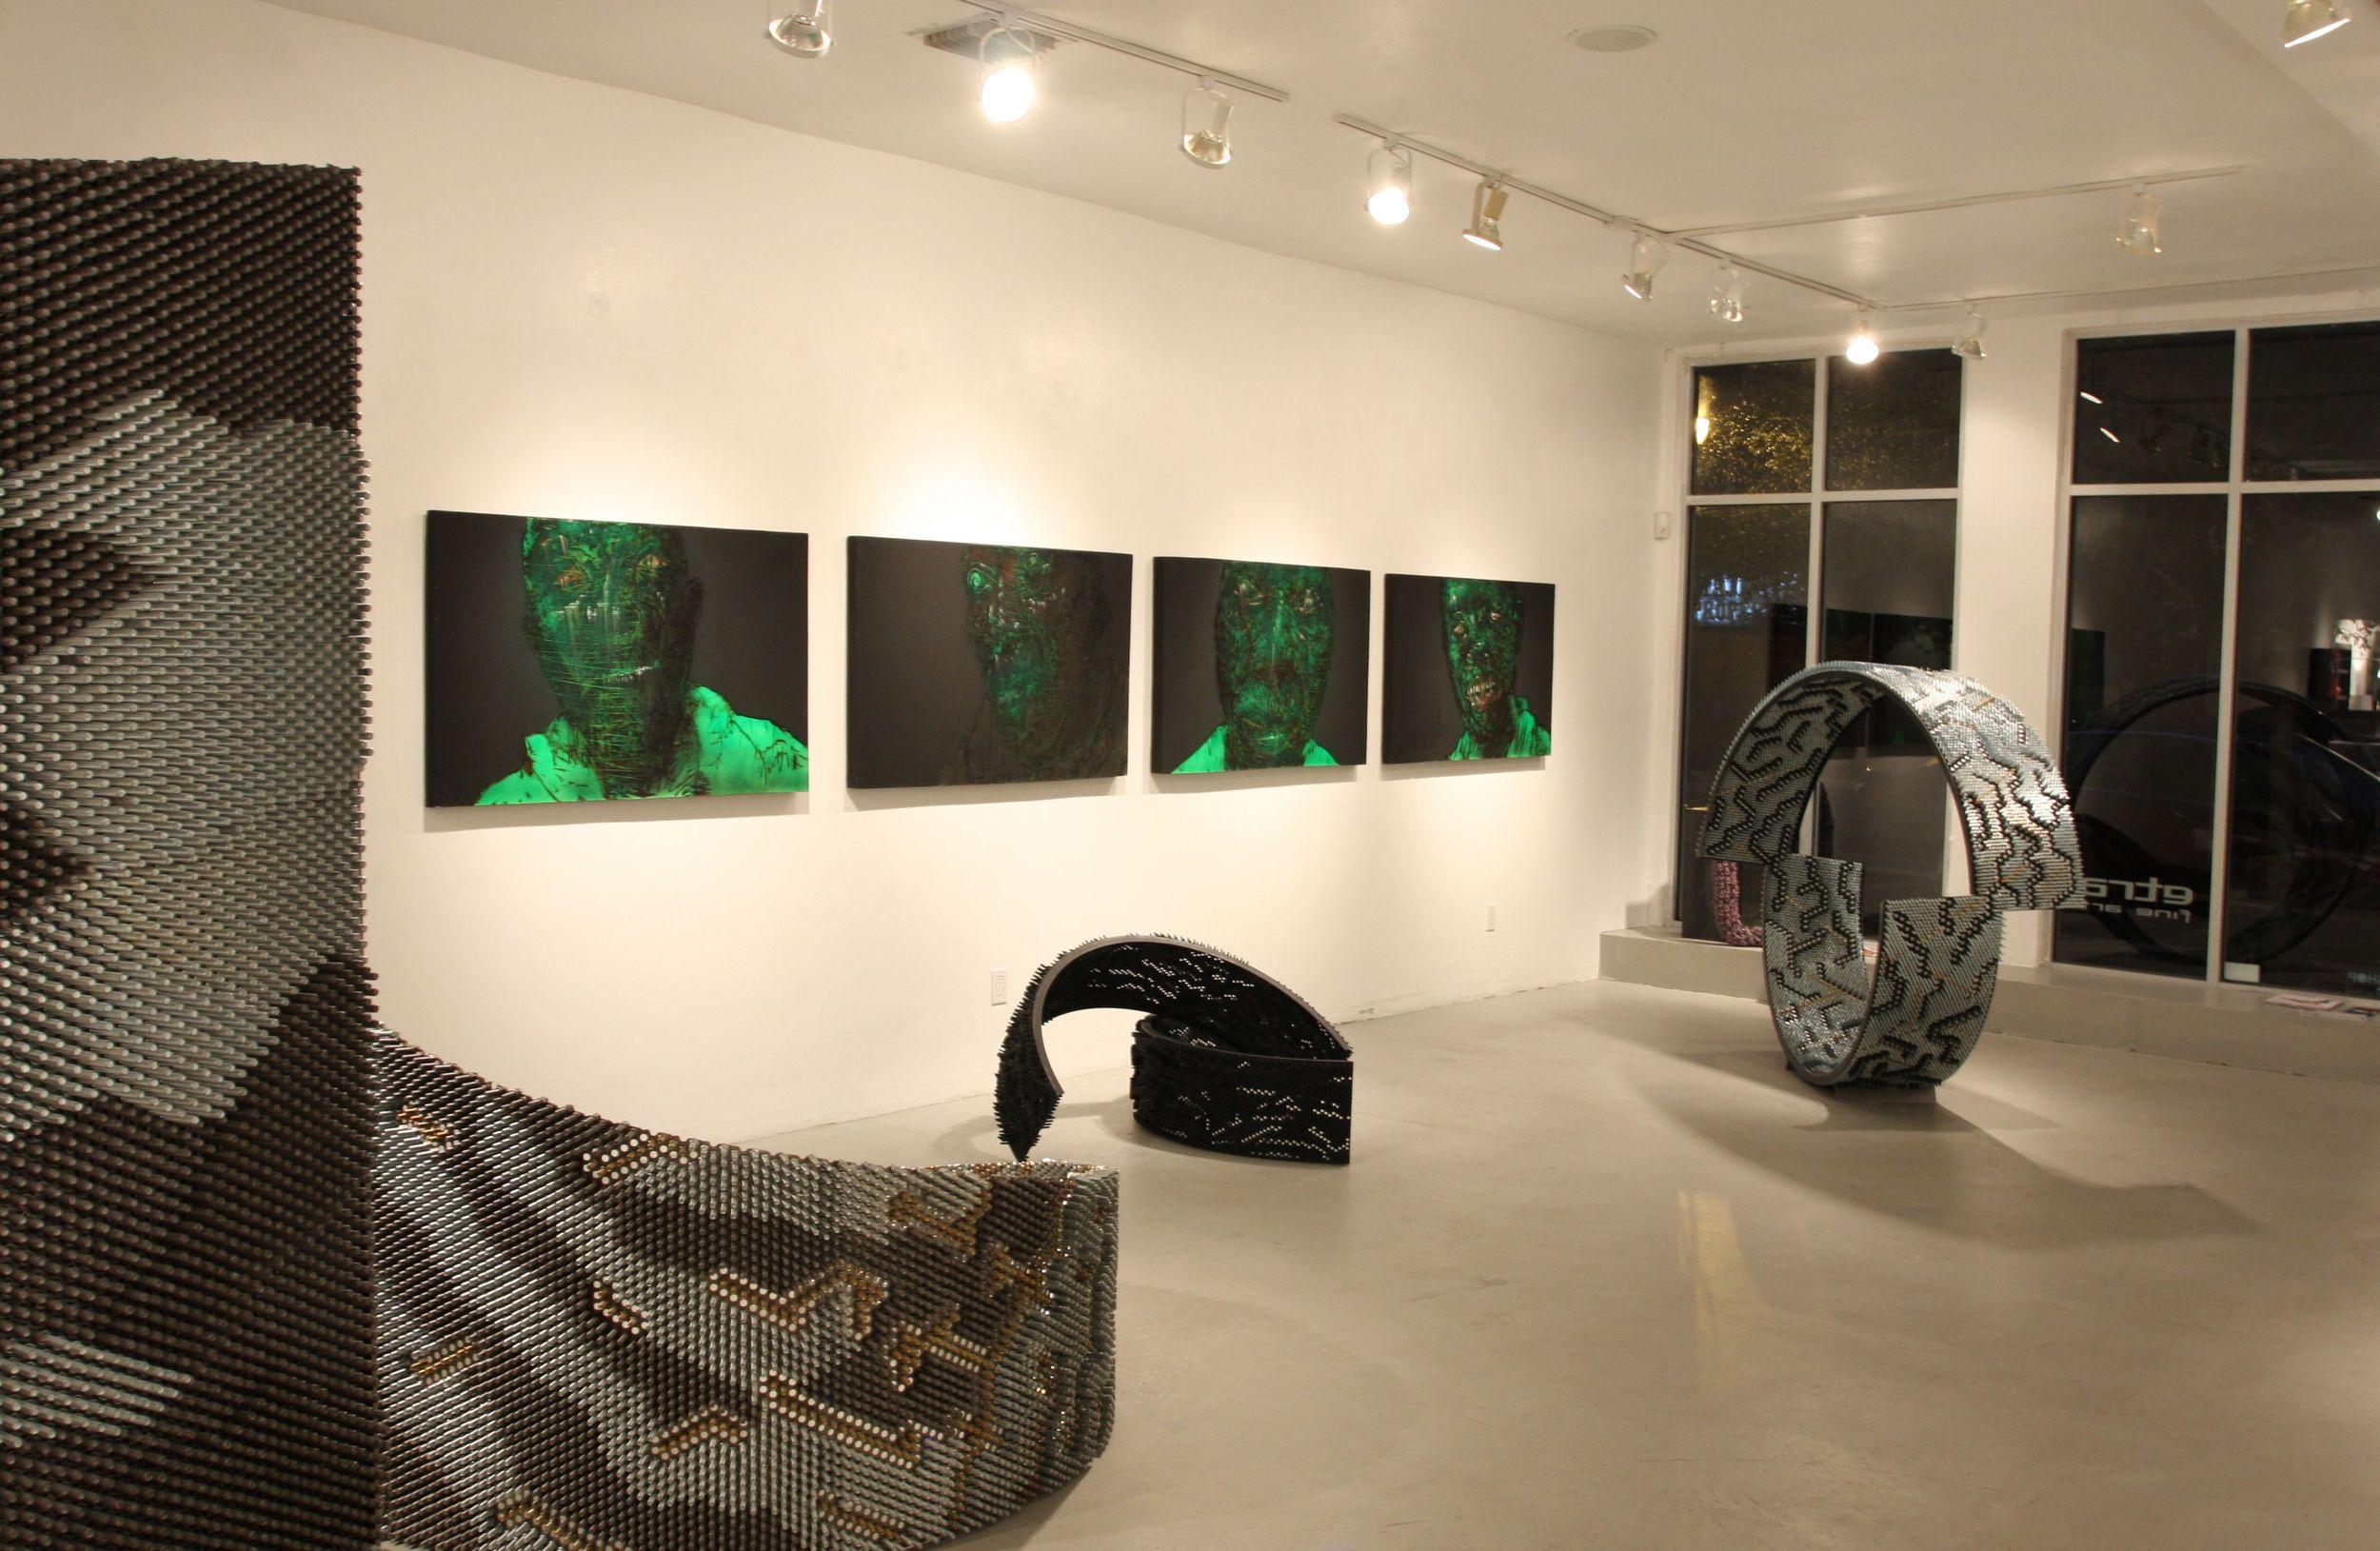 Etra fine art miami gallery, paintings, sculptures, miami usa florida, about